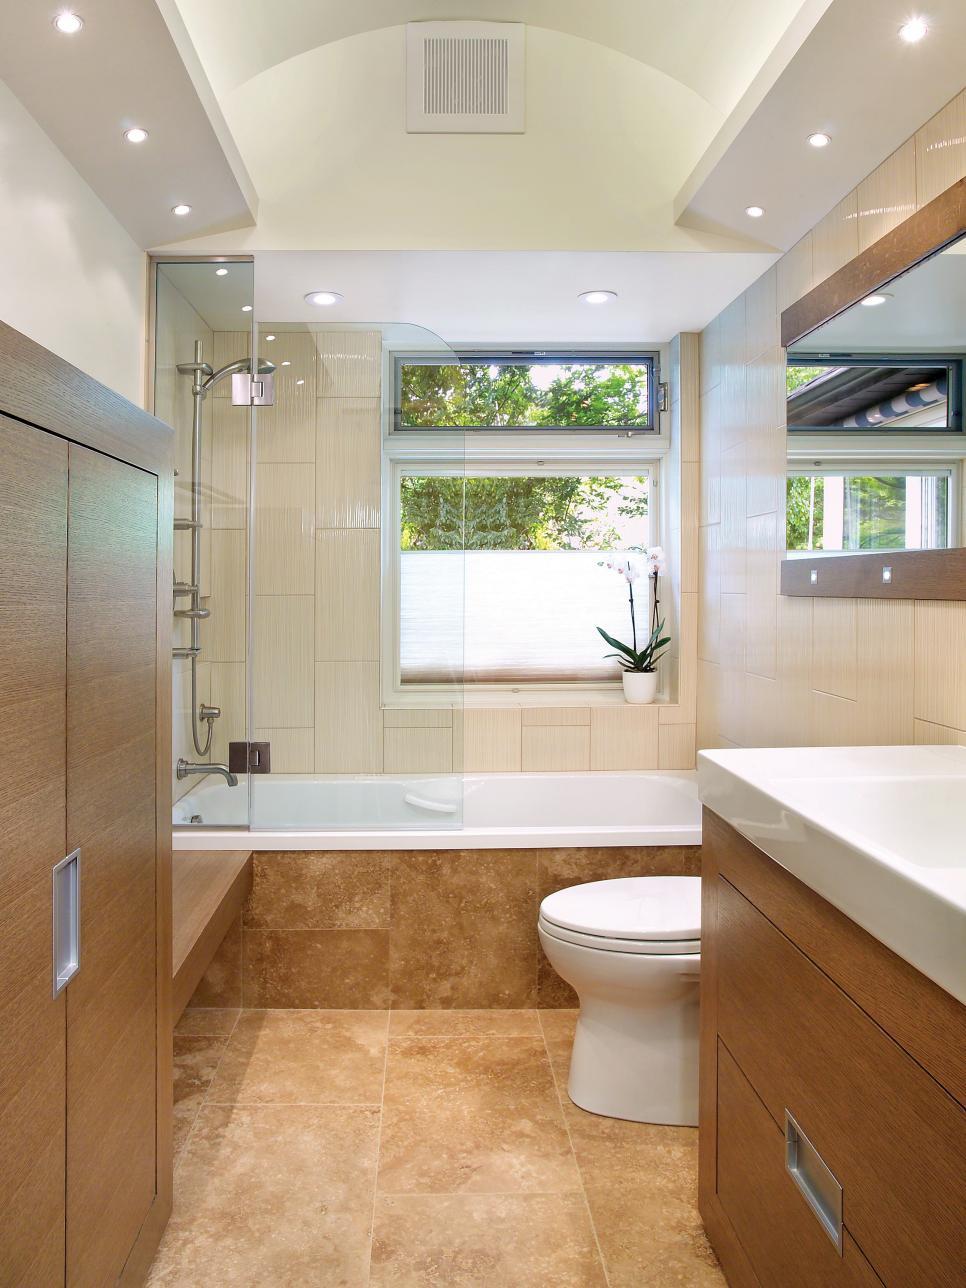 Small Bathroom Design Captivating Small Bathroom Designs